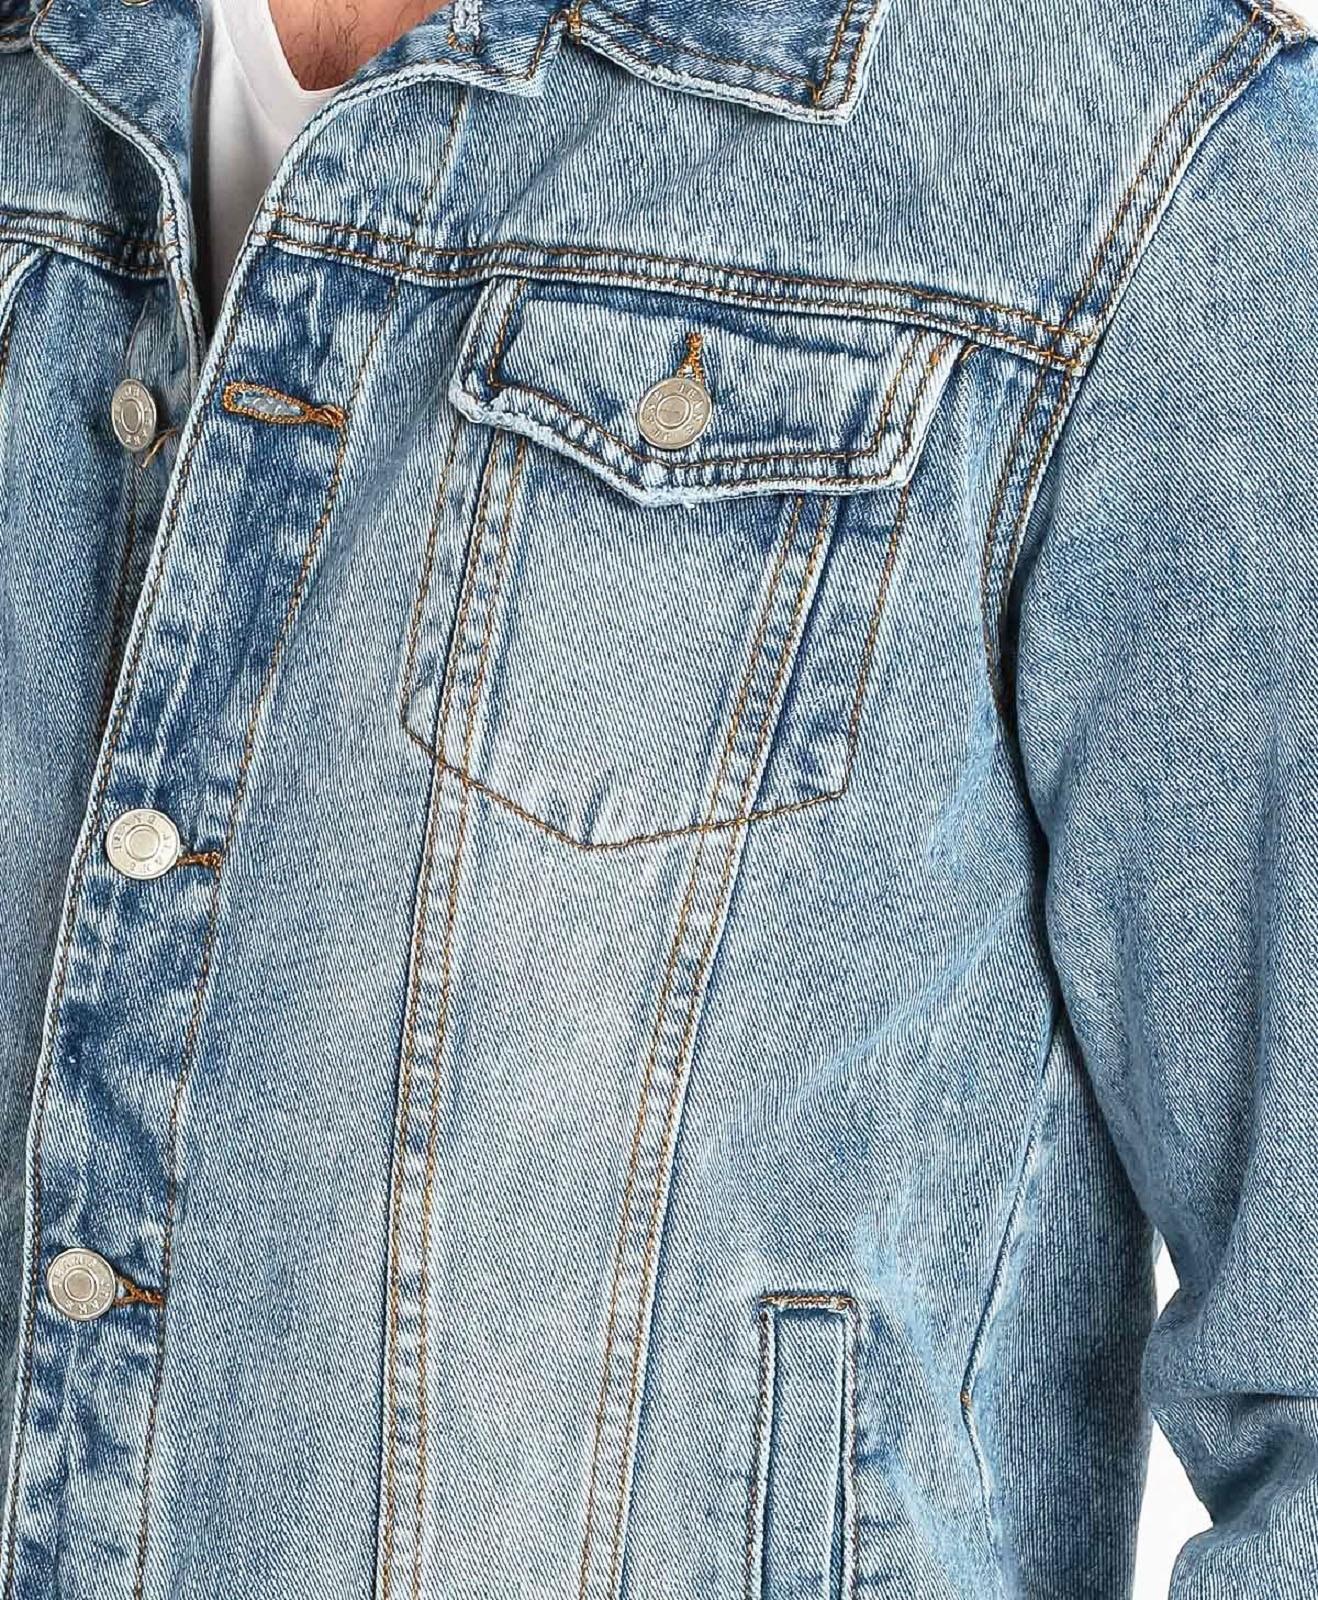 Giubbino-Jeans-Uomo-Giacca-Denim-Casual-Giacca-Slim-Fit-Blu-Chiaro miniatura 13